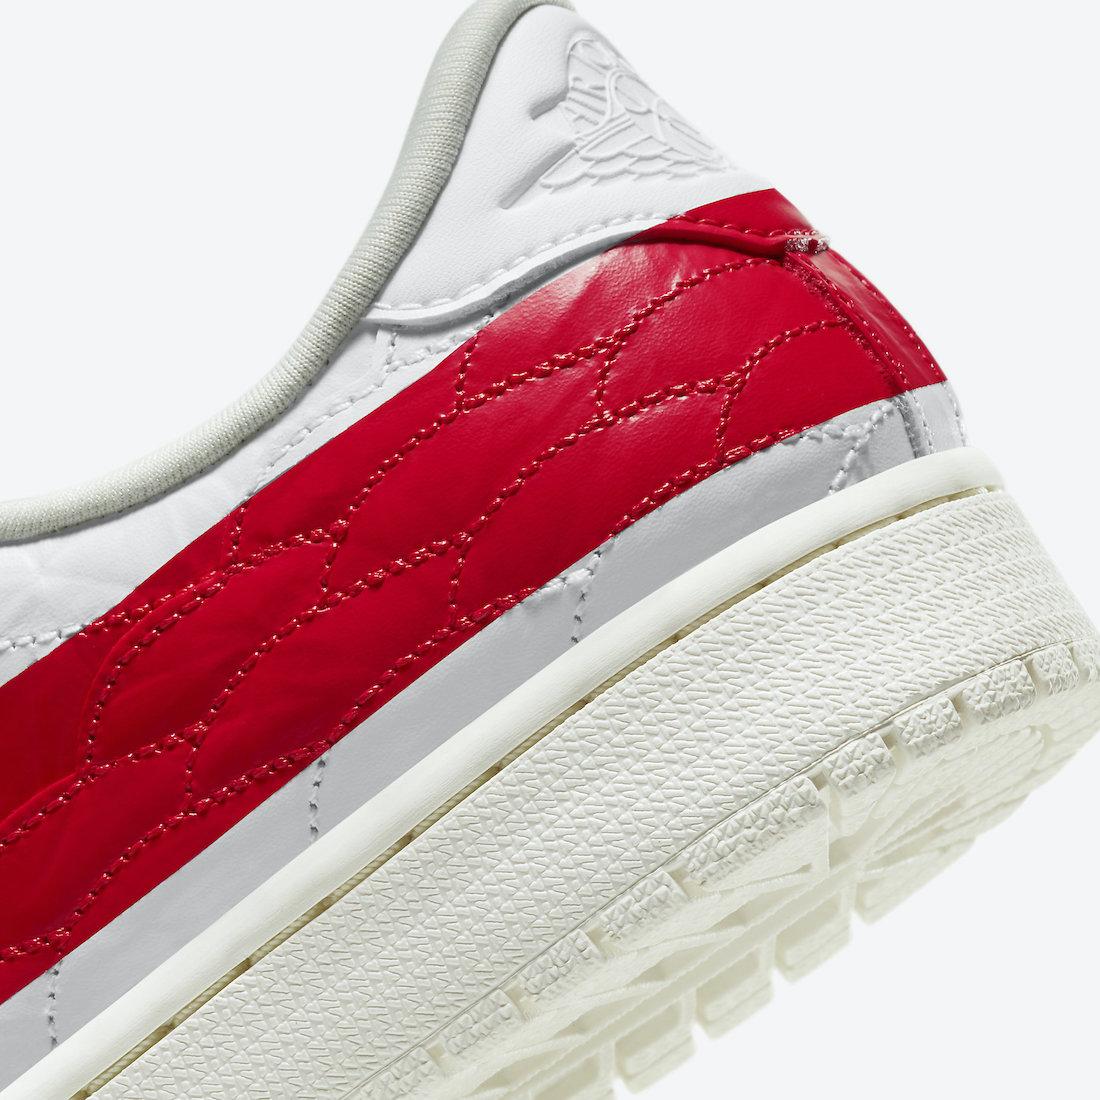 Air Jordan 1 Centre Court White University Red Sail DJ2756-101 Release Date Info